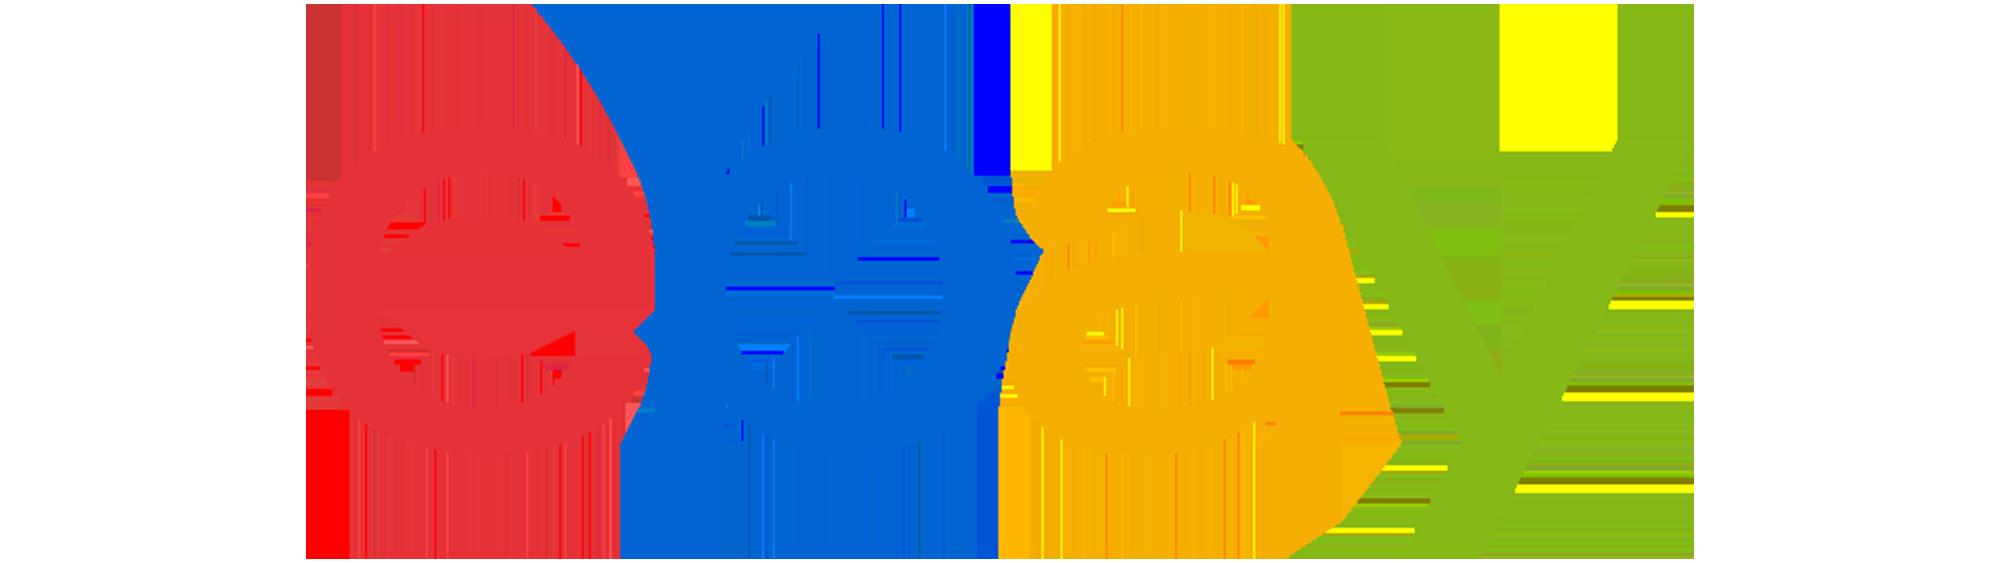 ebaypng